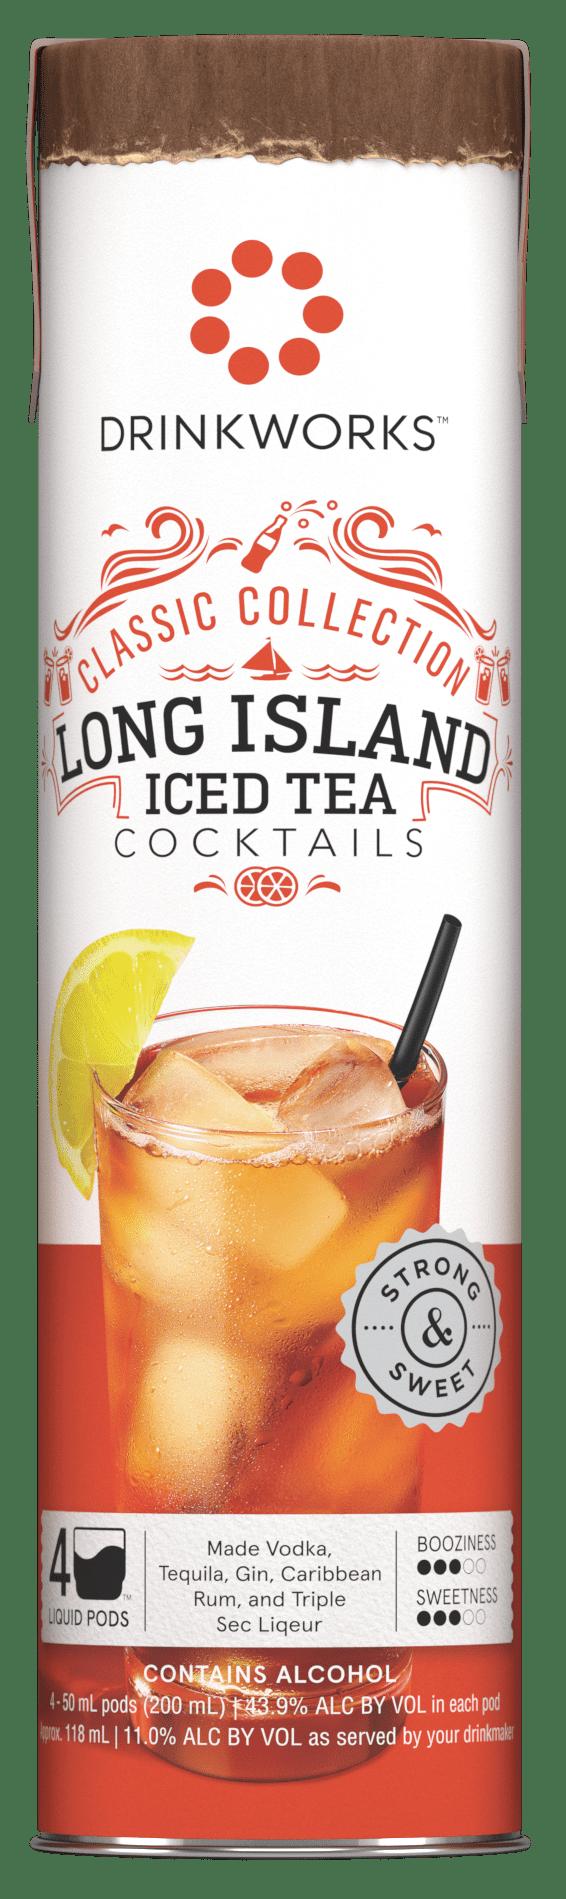 Drinkworks Classic Collection Long Island Iced Tea 43 9 Abv Walmart Com Walmart Com